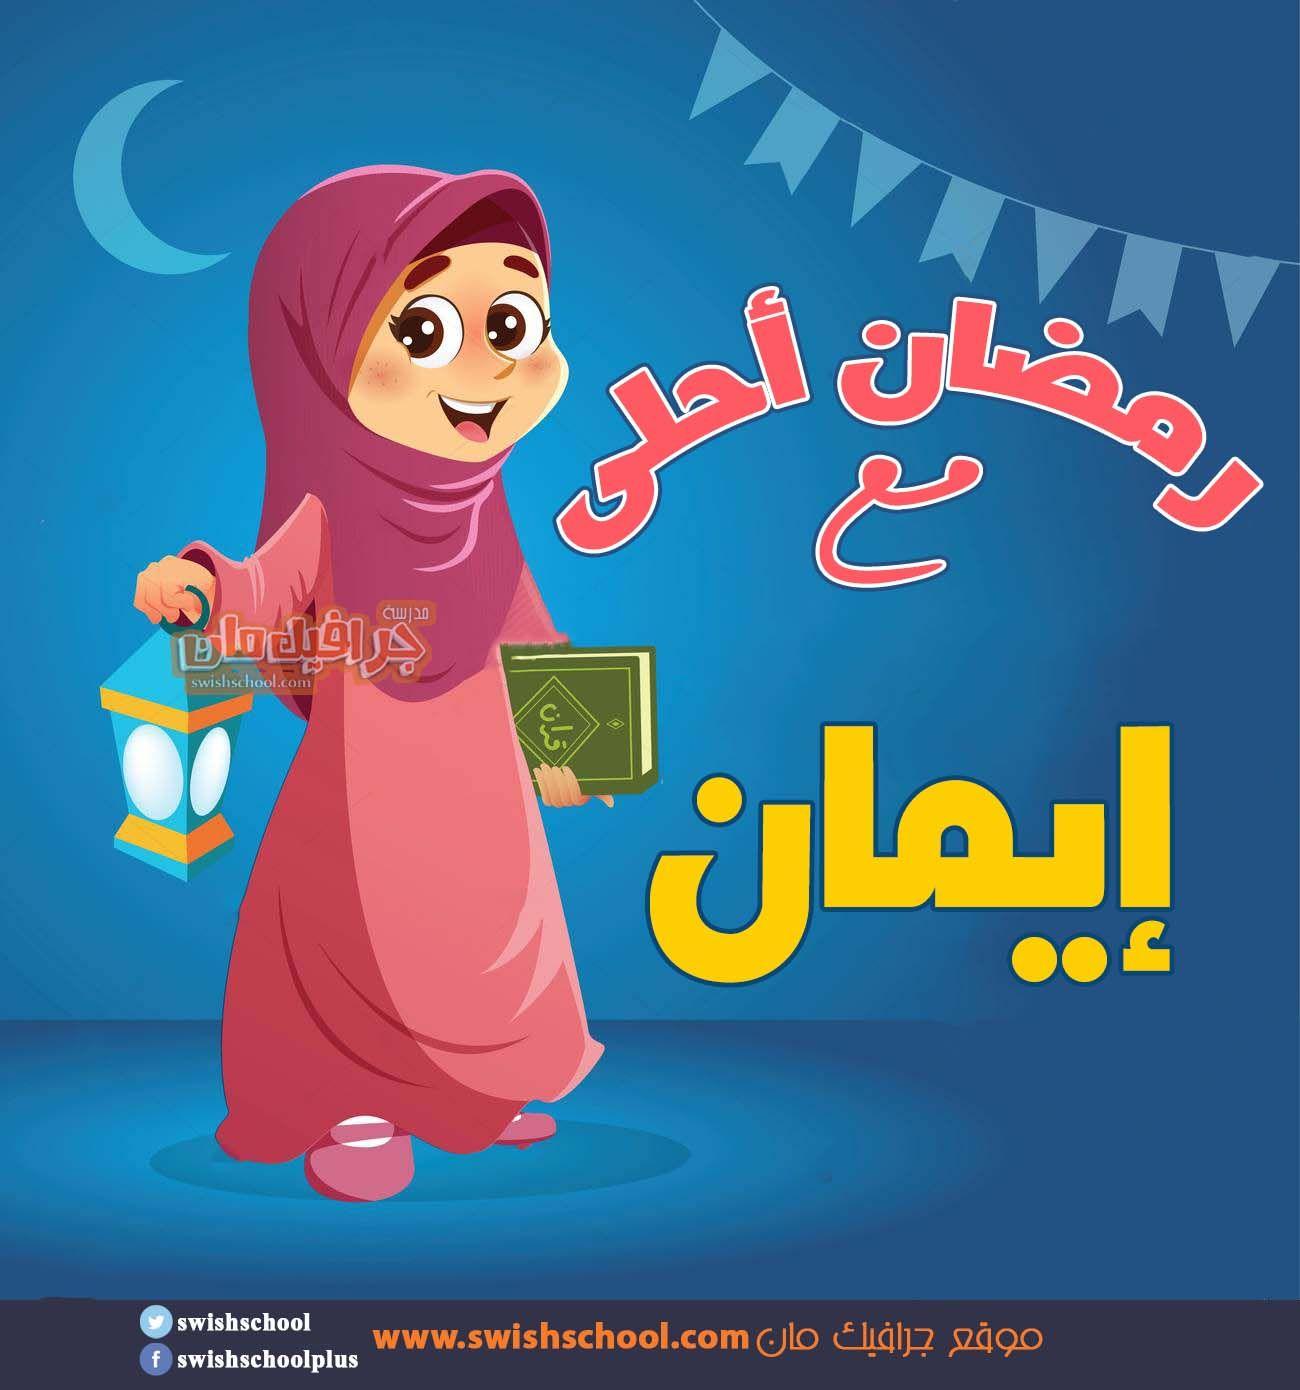 Pin By Chehab Em Omar On رمضان احلى مع Romantic Art Ramadan Disney Characters